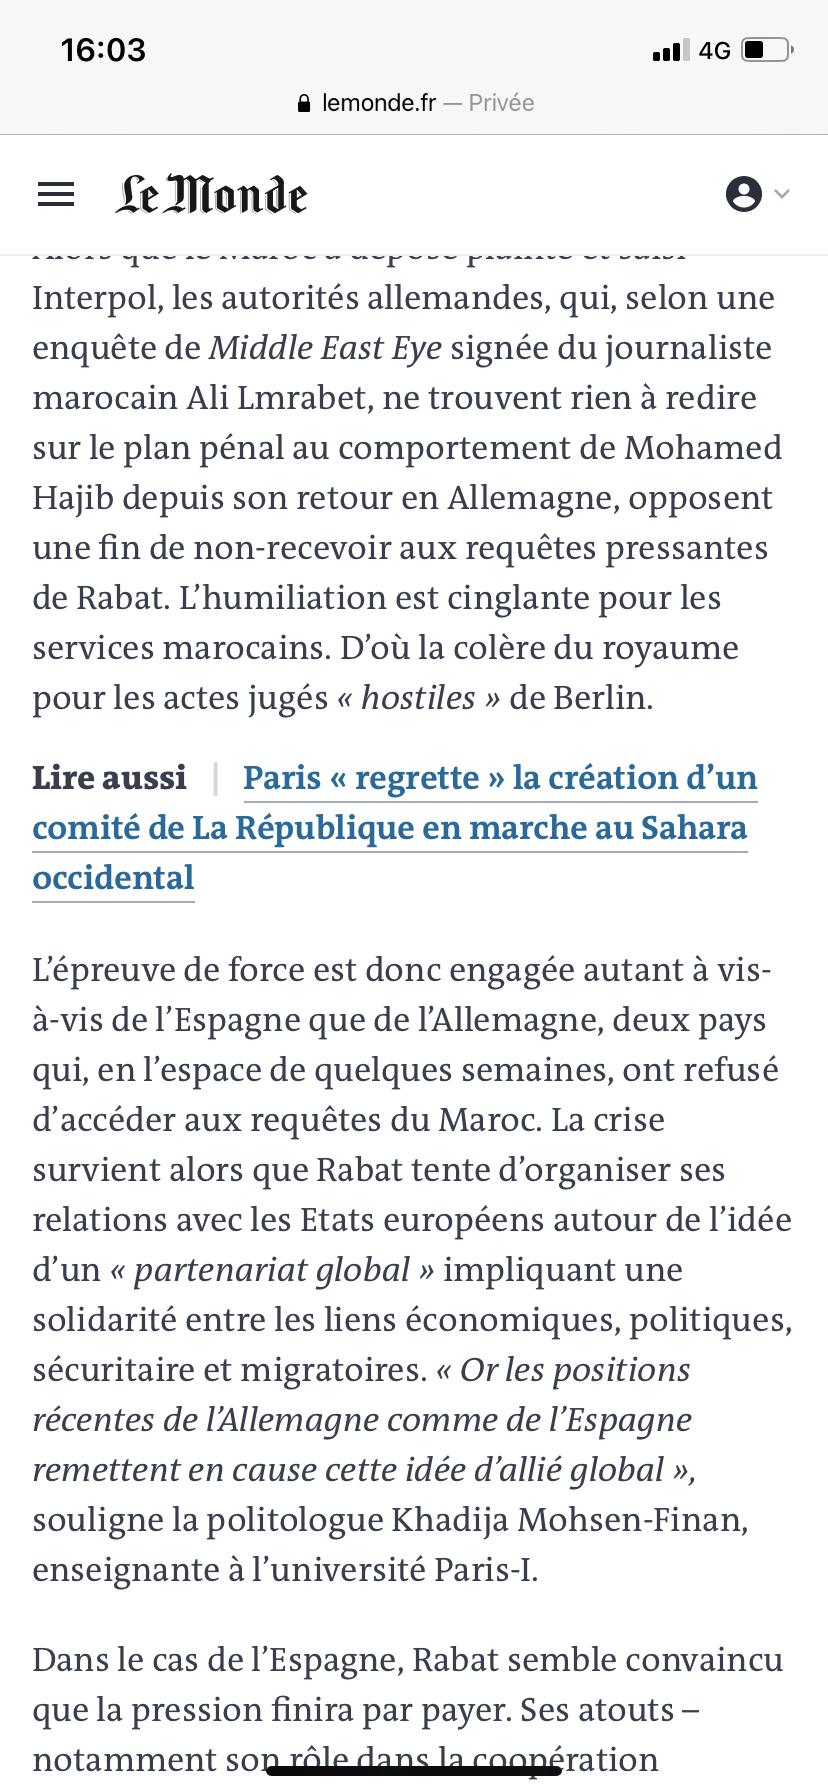 Diplomatie marocaine - Relations internationales 815